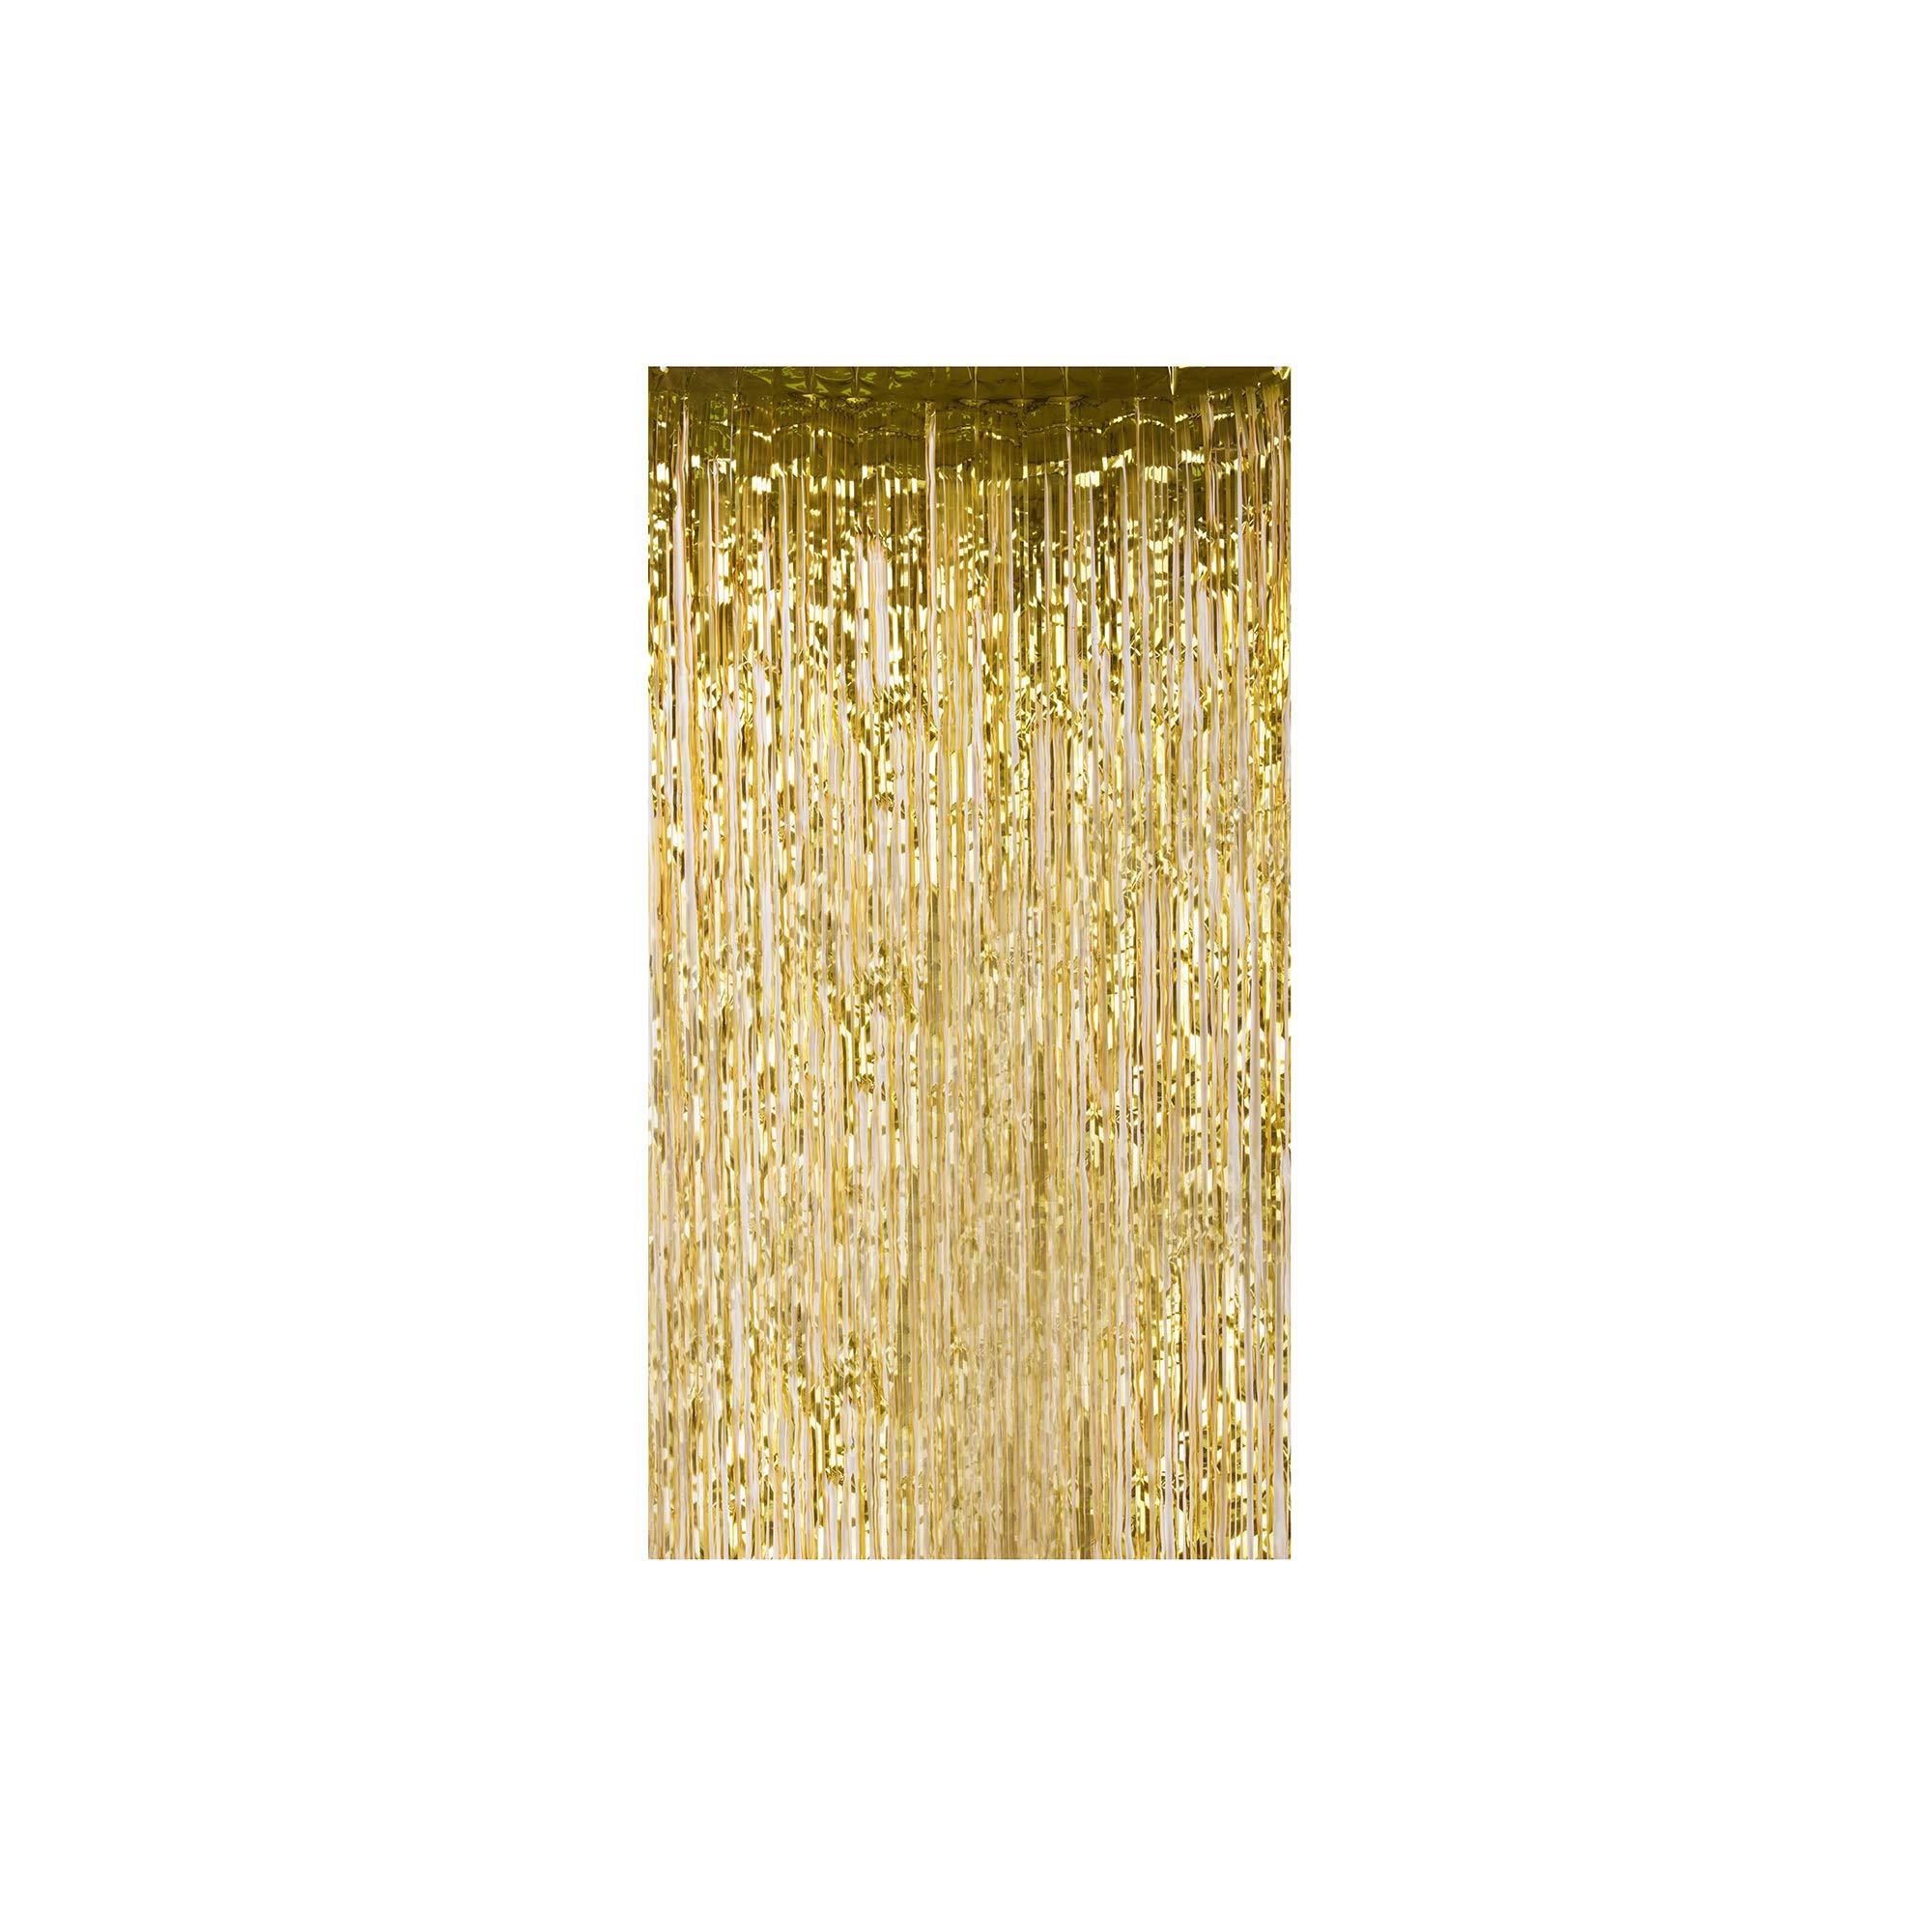 Lelinta 3.28X9.84ft Metallic Tinsel Foil Shimmer Fringe Rain Curtains Backdrop Curtain for Wedding Party Birthday Photo Background Decorations (Gold-2 PCS)